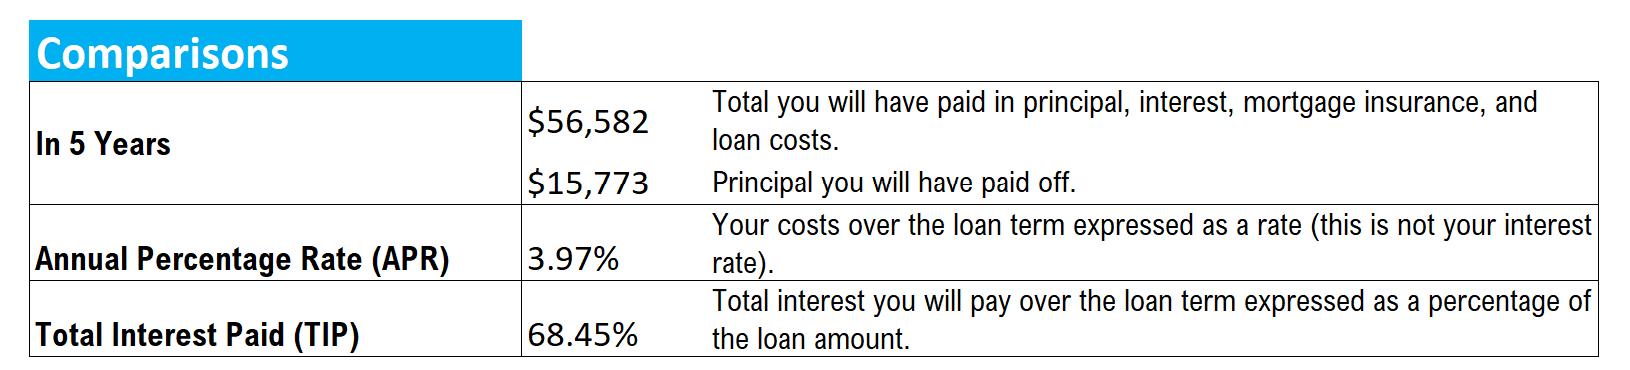 Comparisons section on a typical loan estimate (Lendgo)